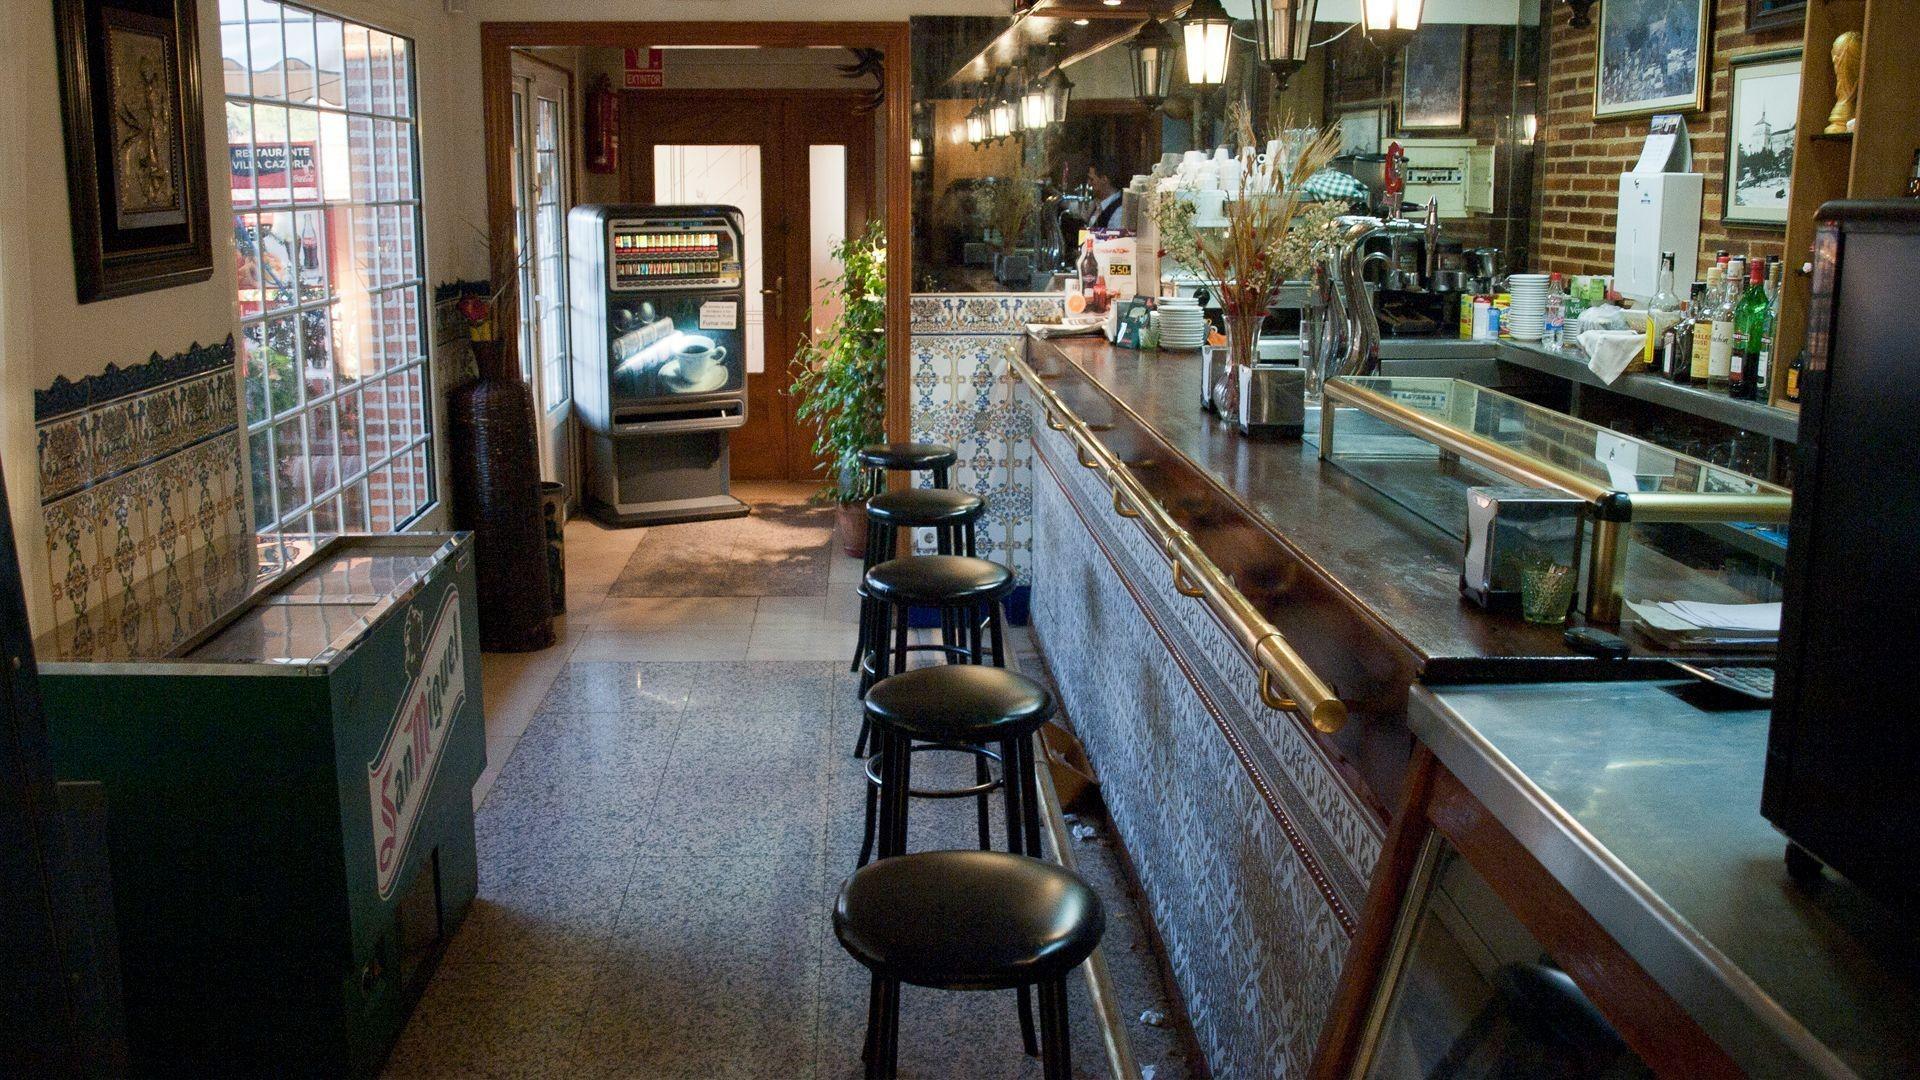 Restaurante con menú diario en Villaviciosa de Odón